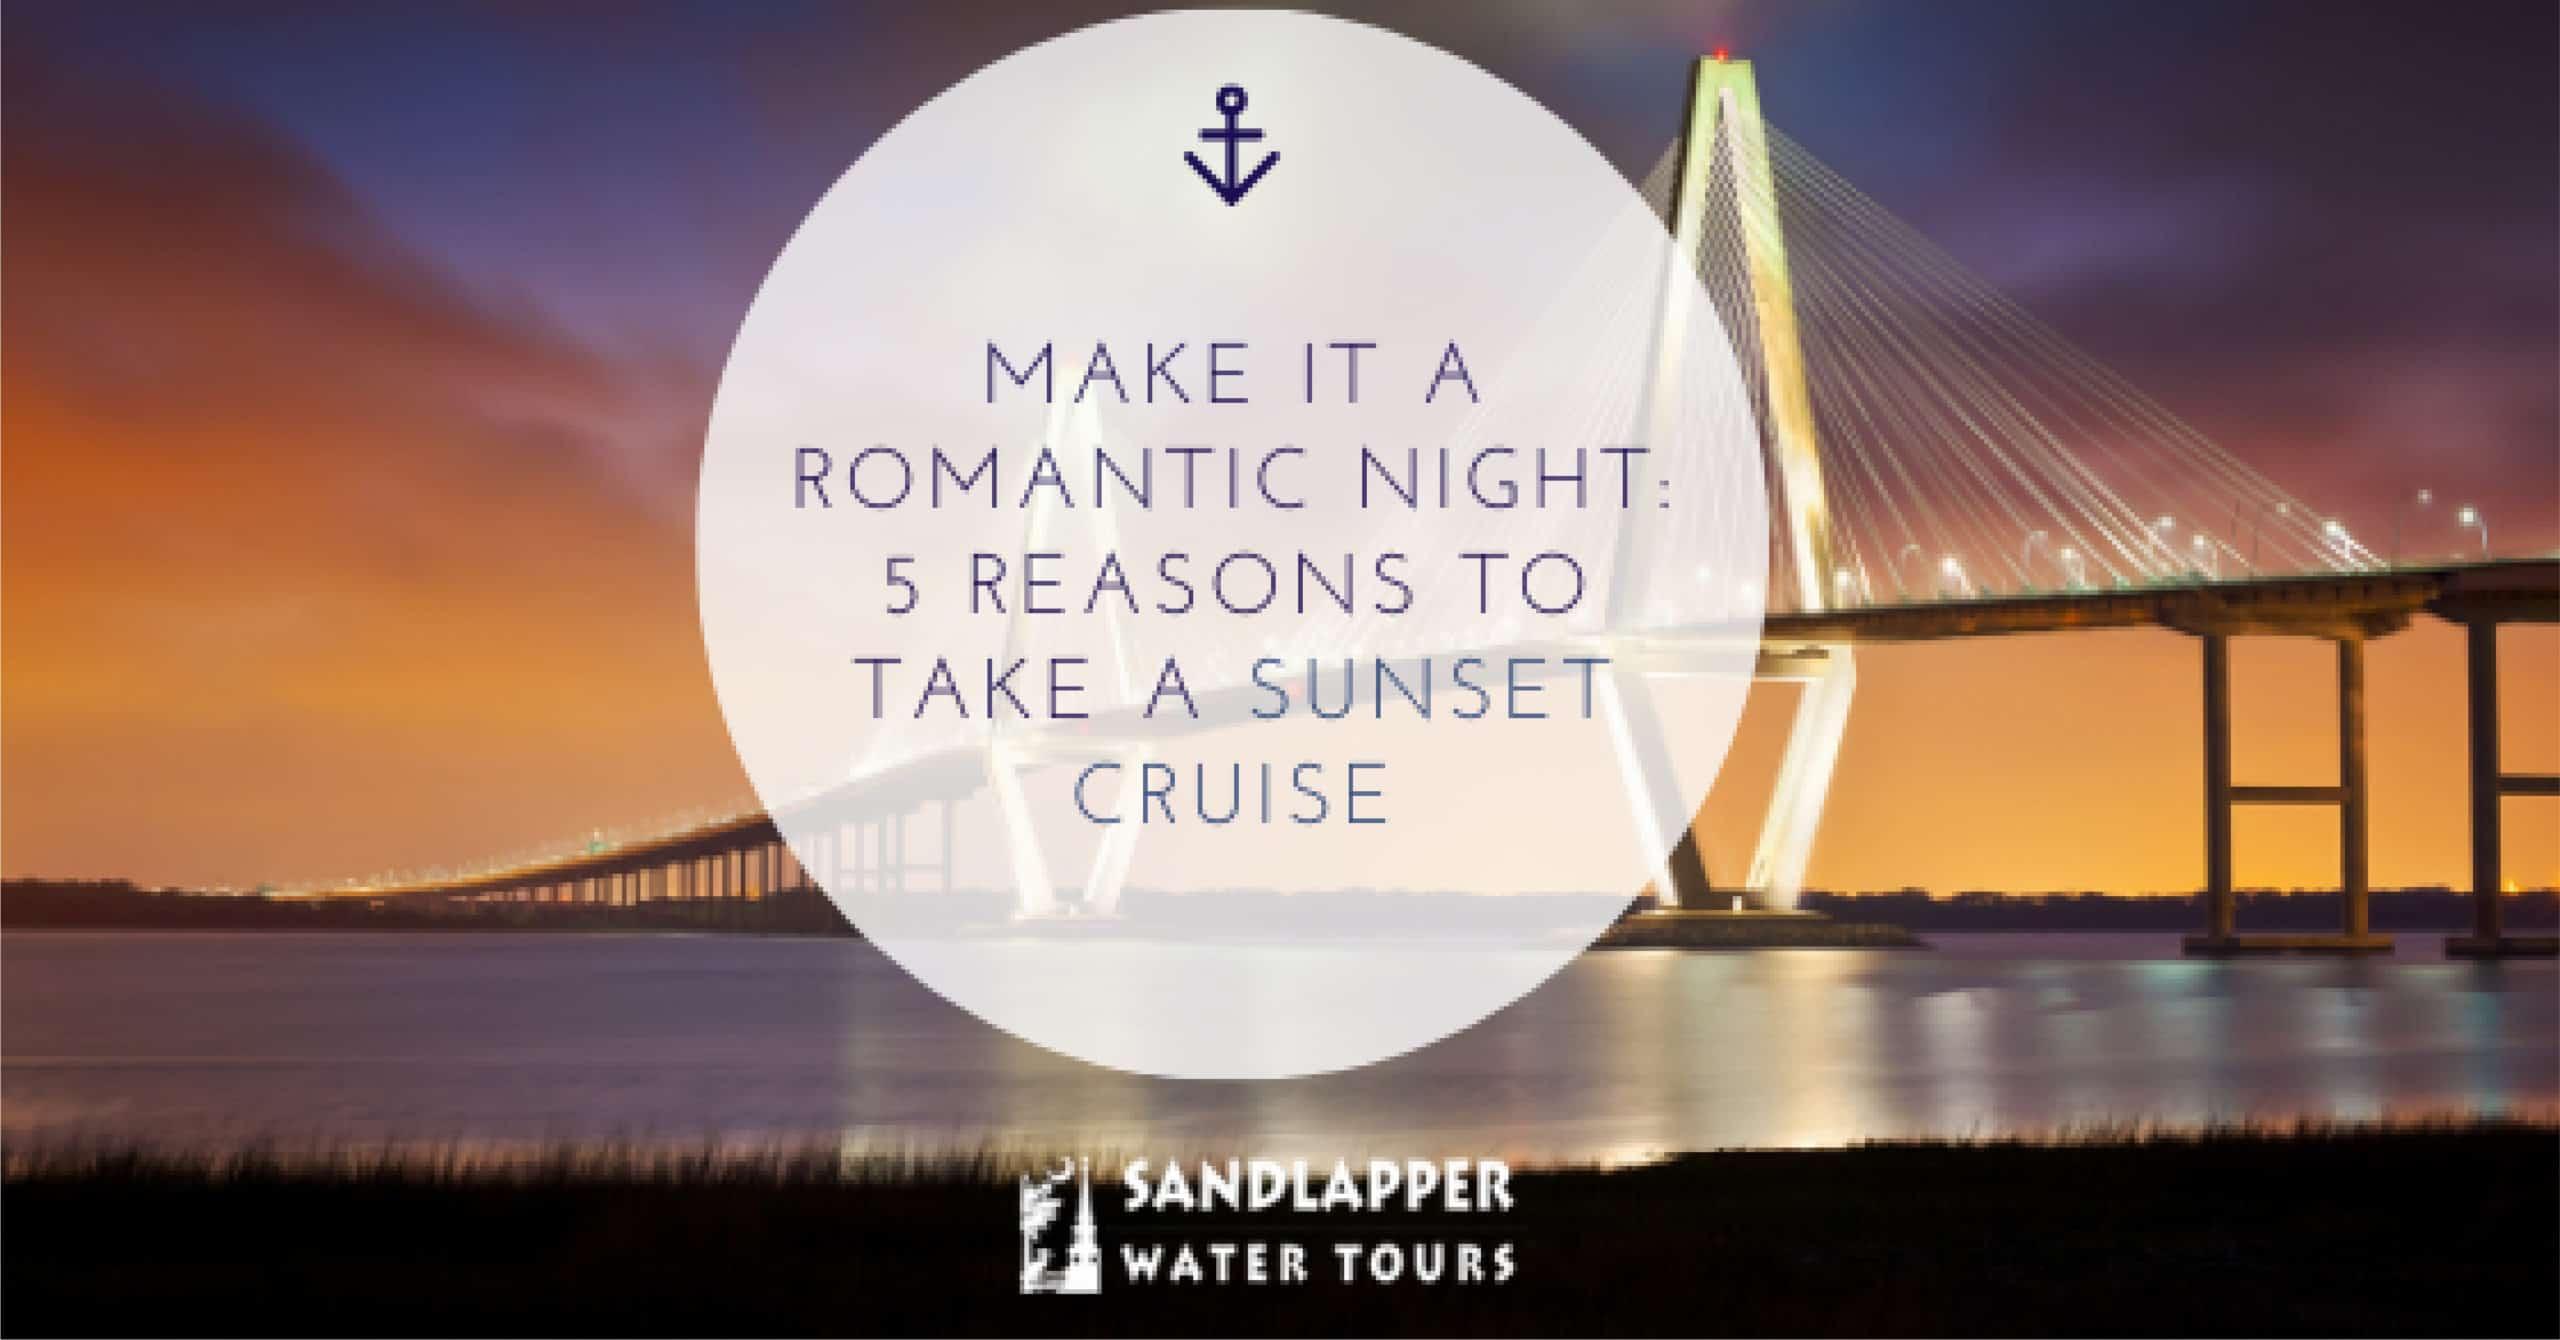 Make it a Romantic Night: 5 Reasons to Take a Sunset Cruise. Sandlapper Water Tours Blog